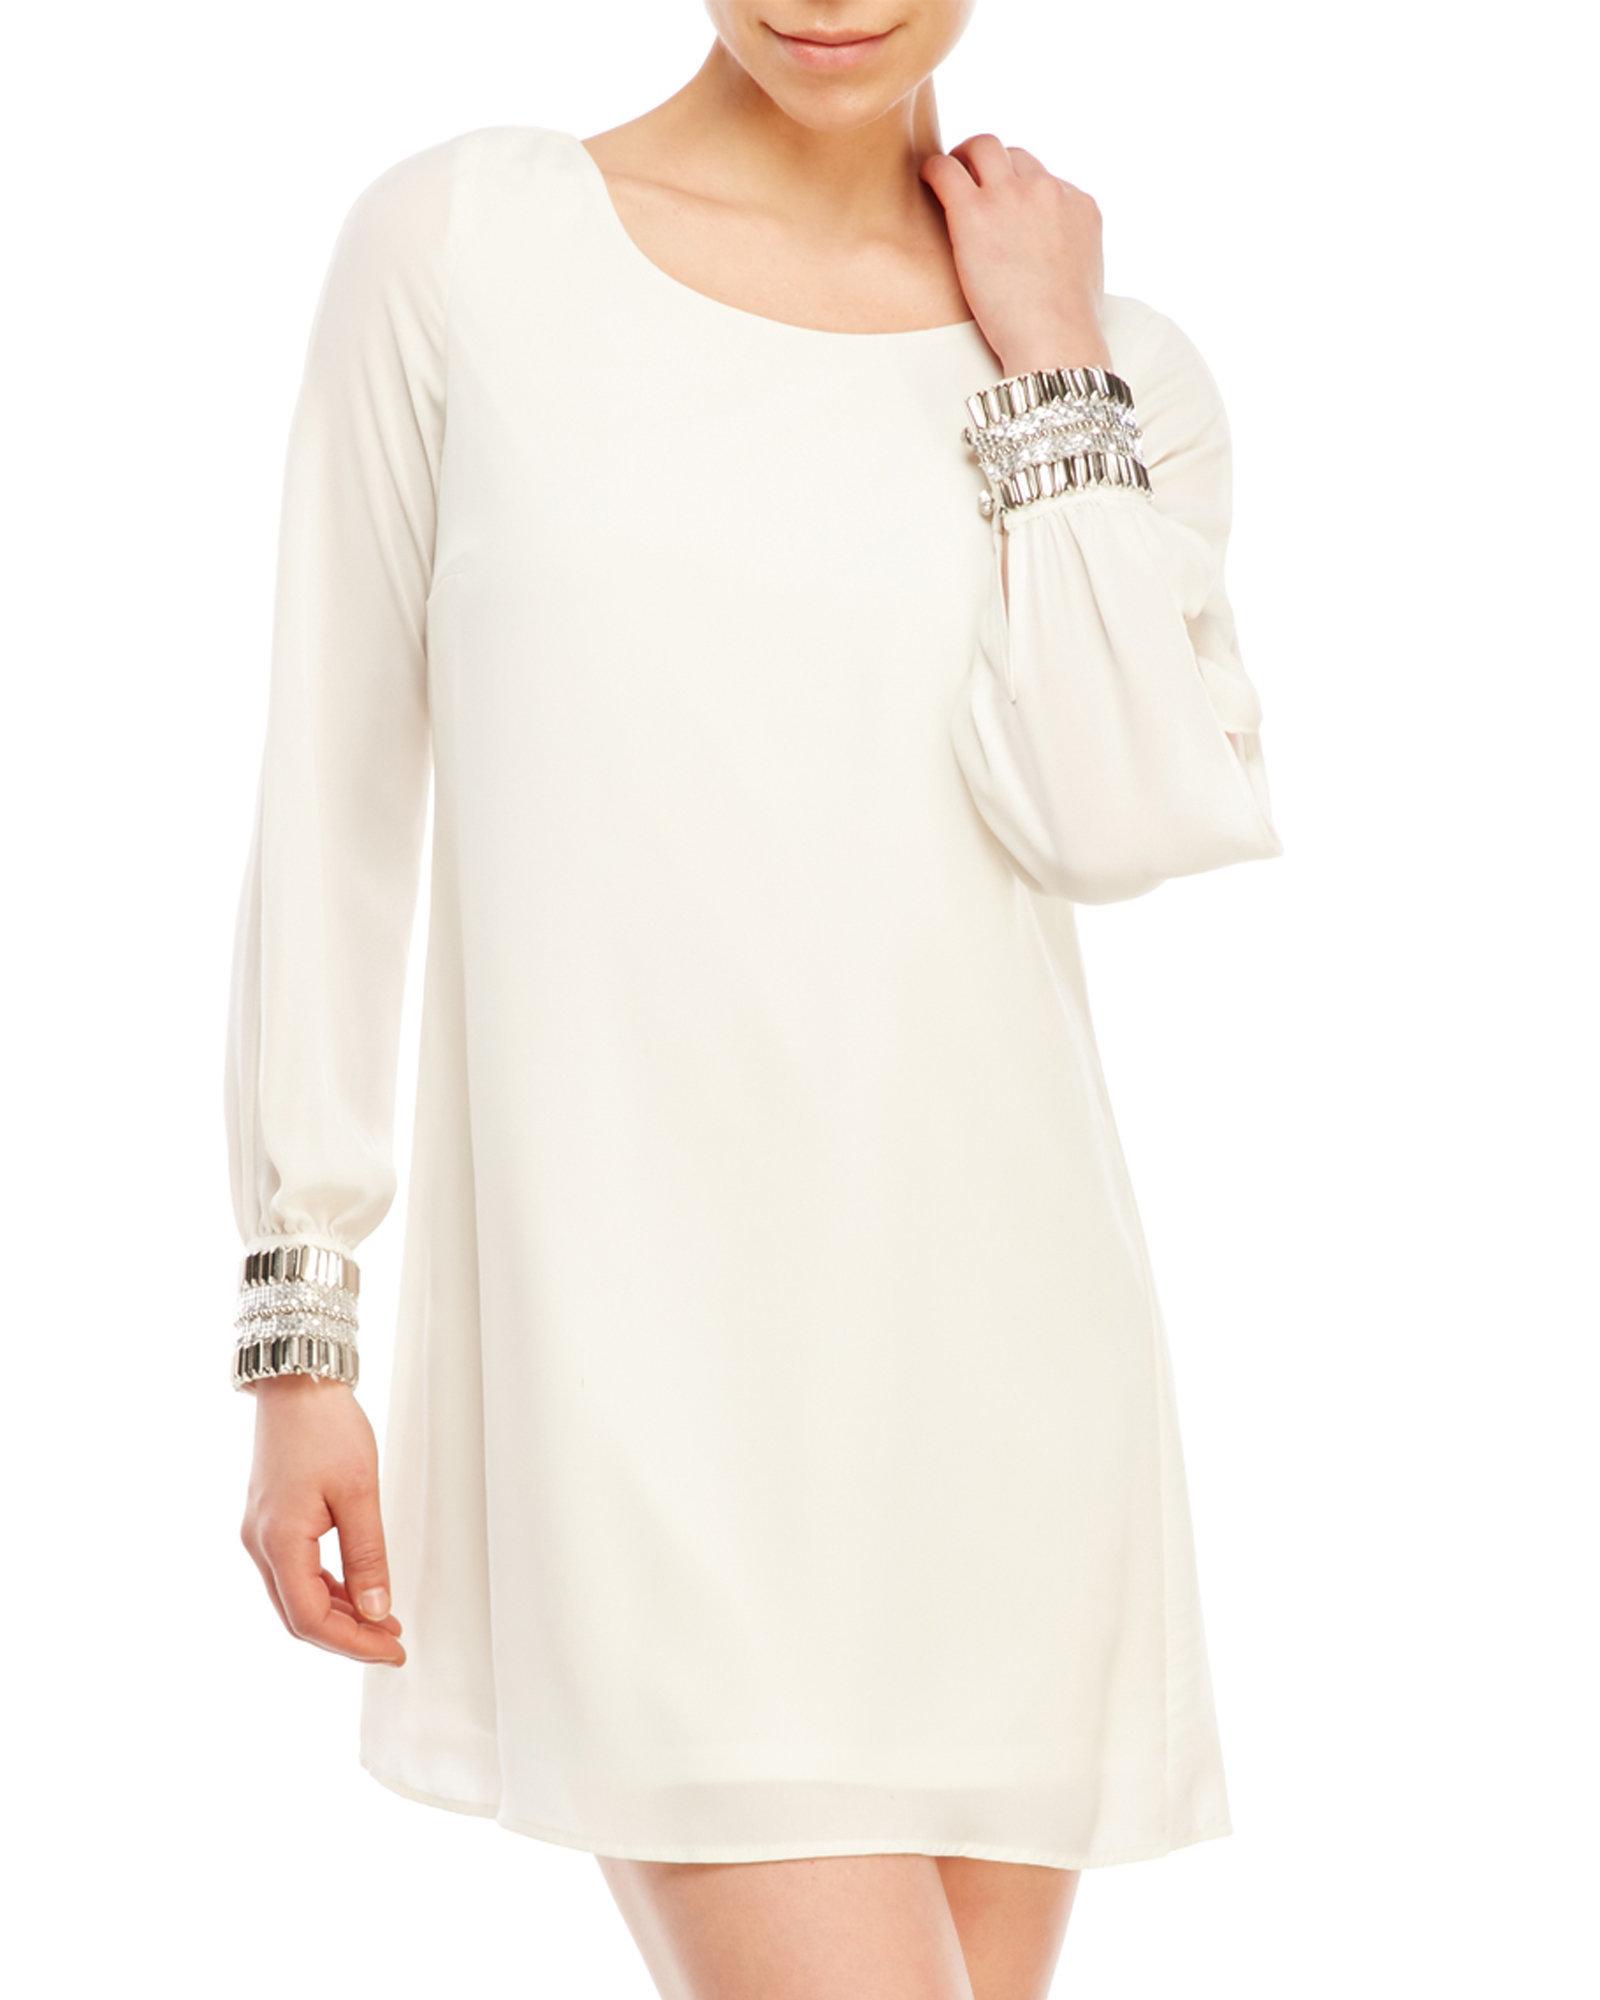 Ivory Shift Dress